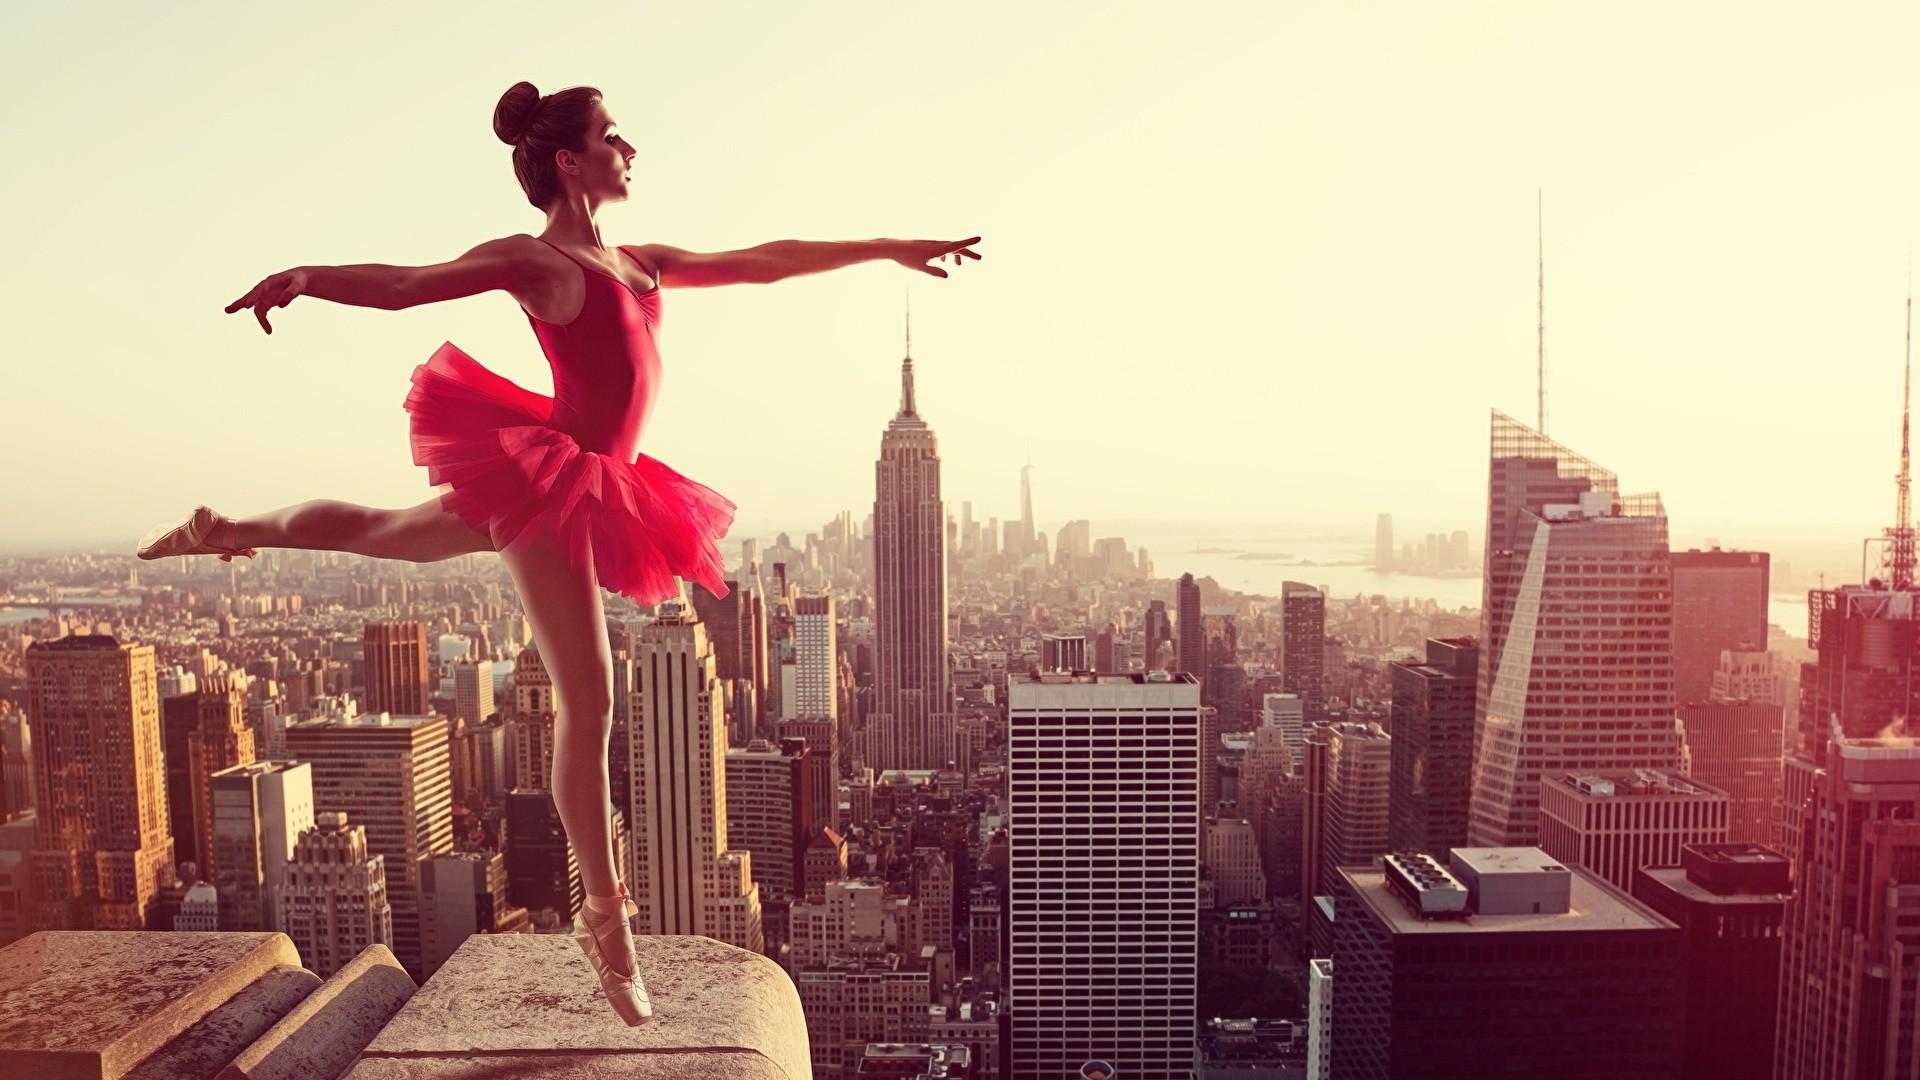 Dance Wallpaper Picture hd